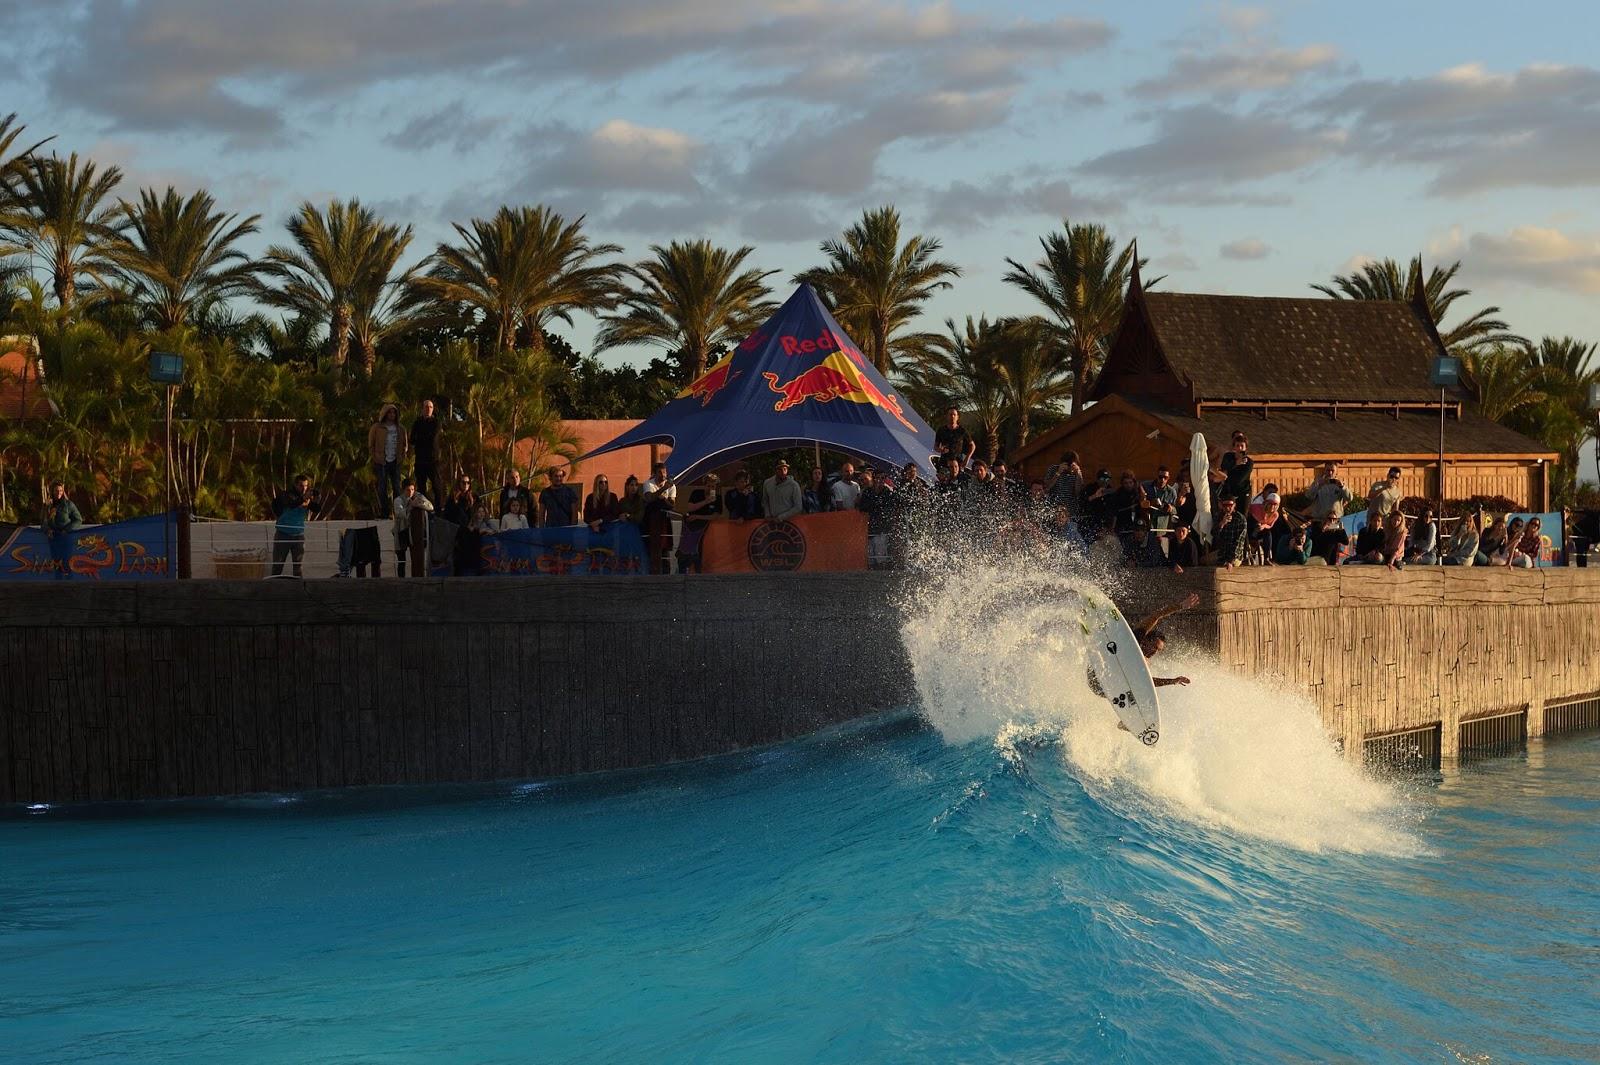 Siam Park Las Américas PRO Tenerife Surf Exhibition